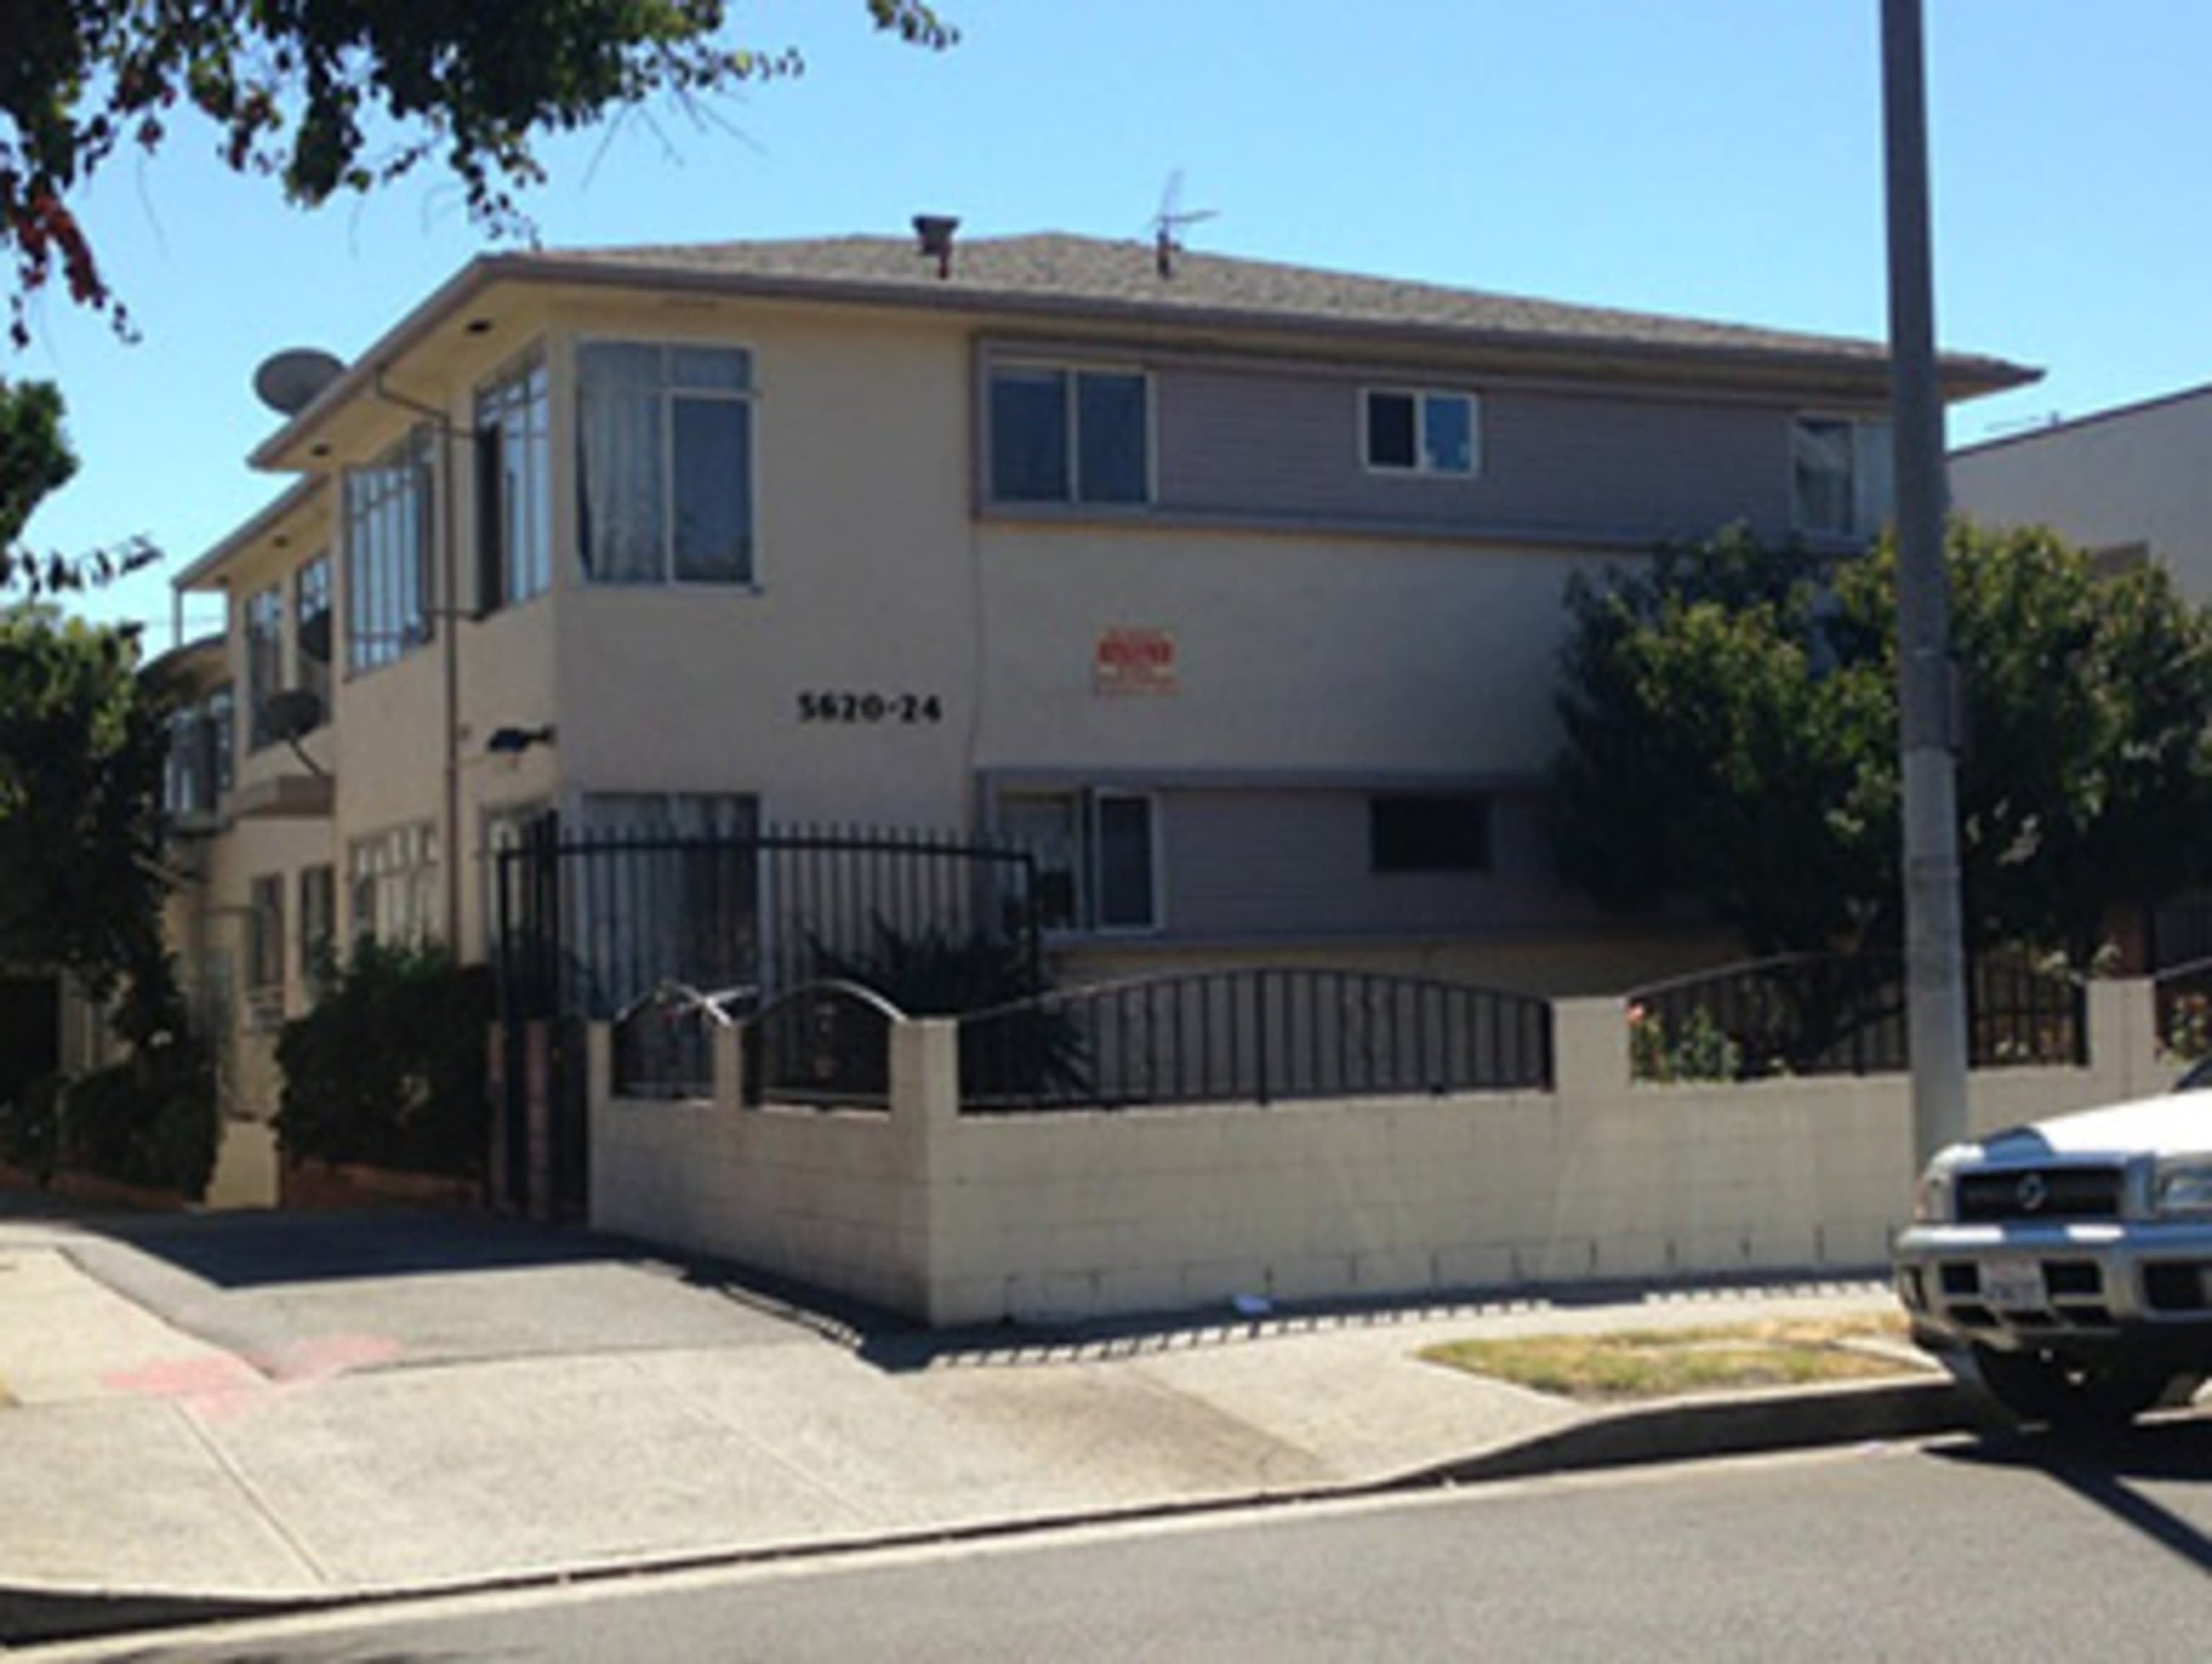 Bela Lugosi's Apartment   Discover Los Angeles